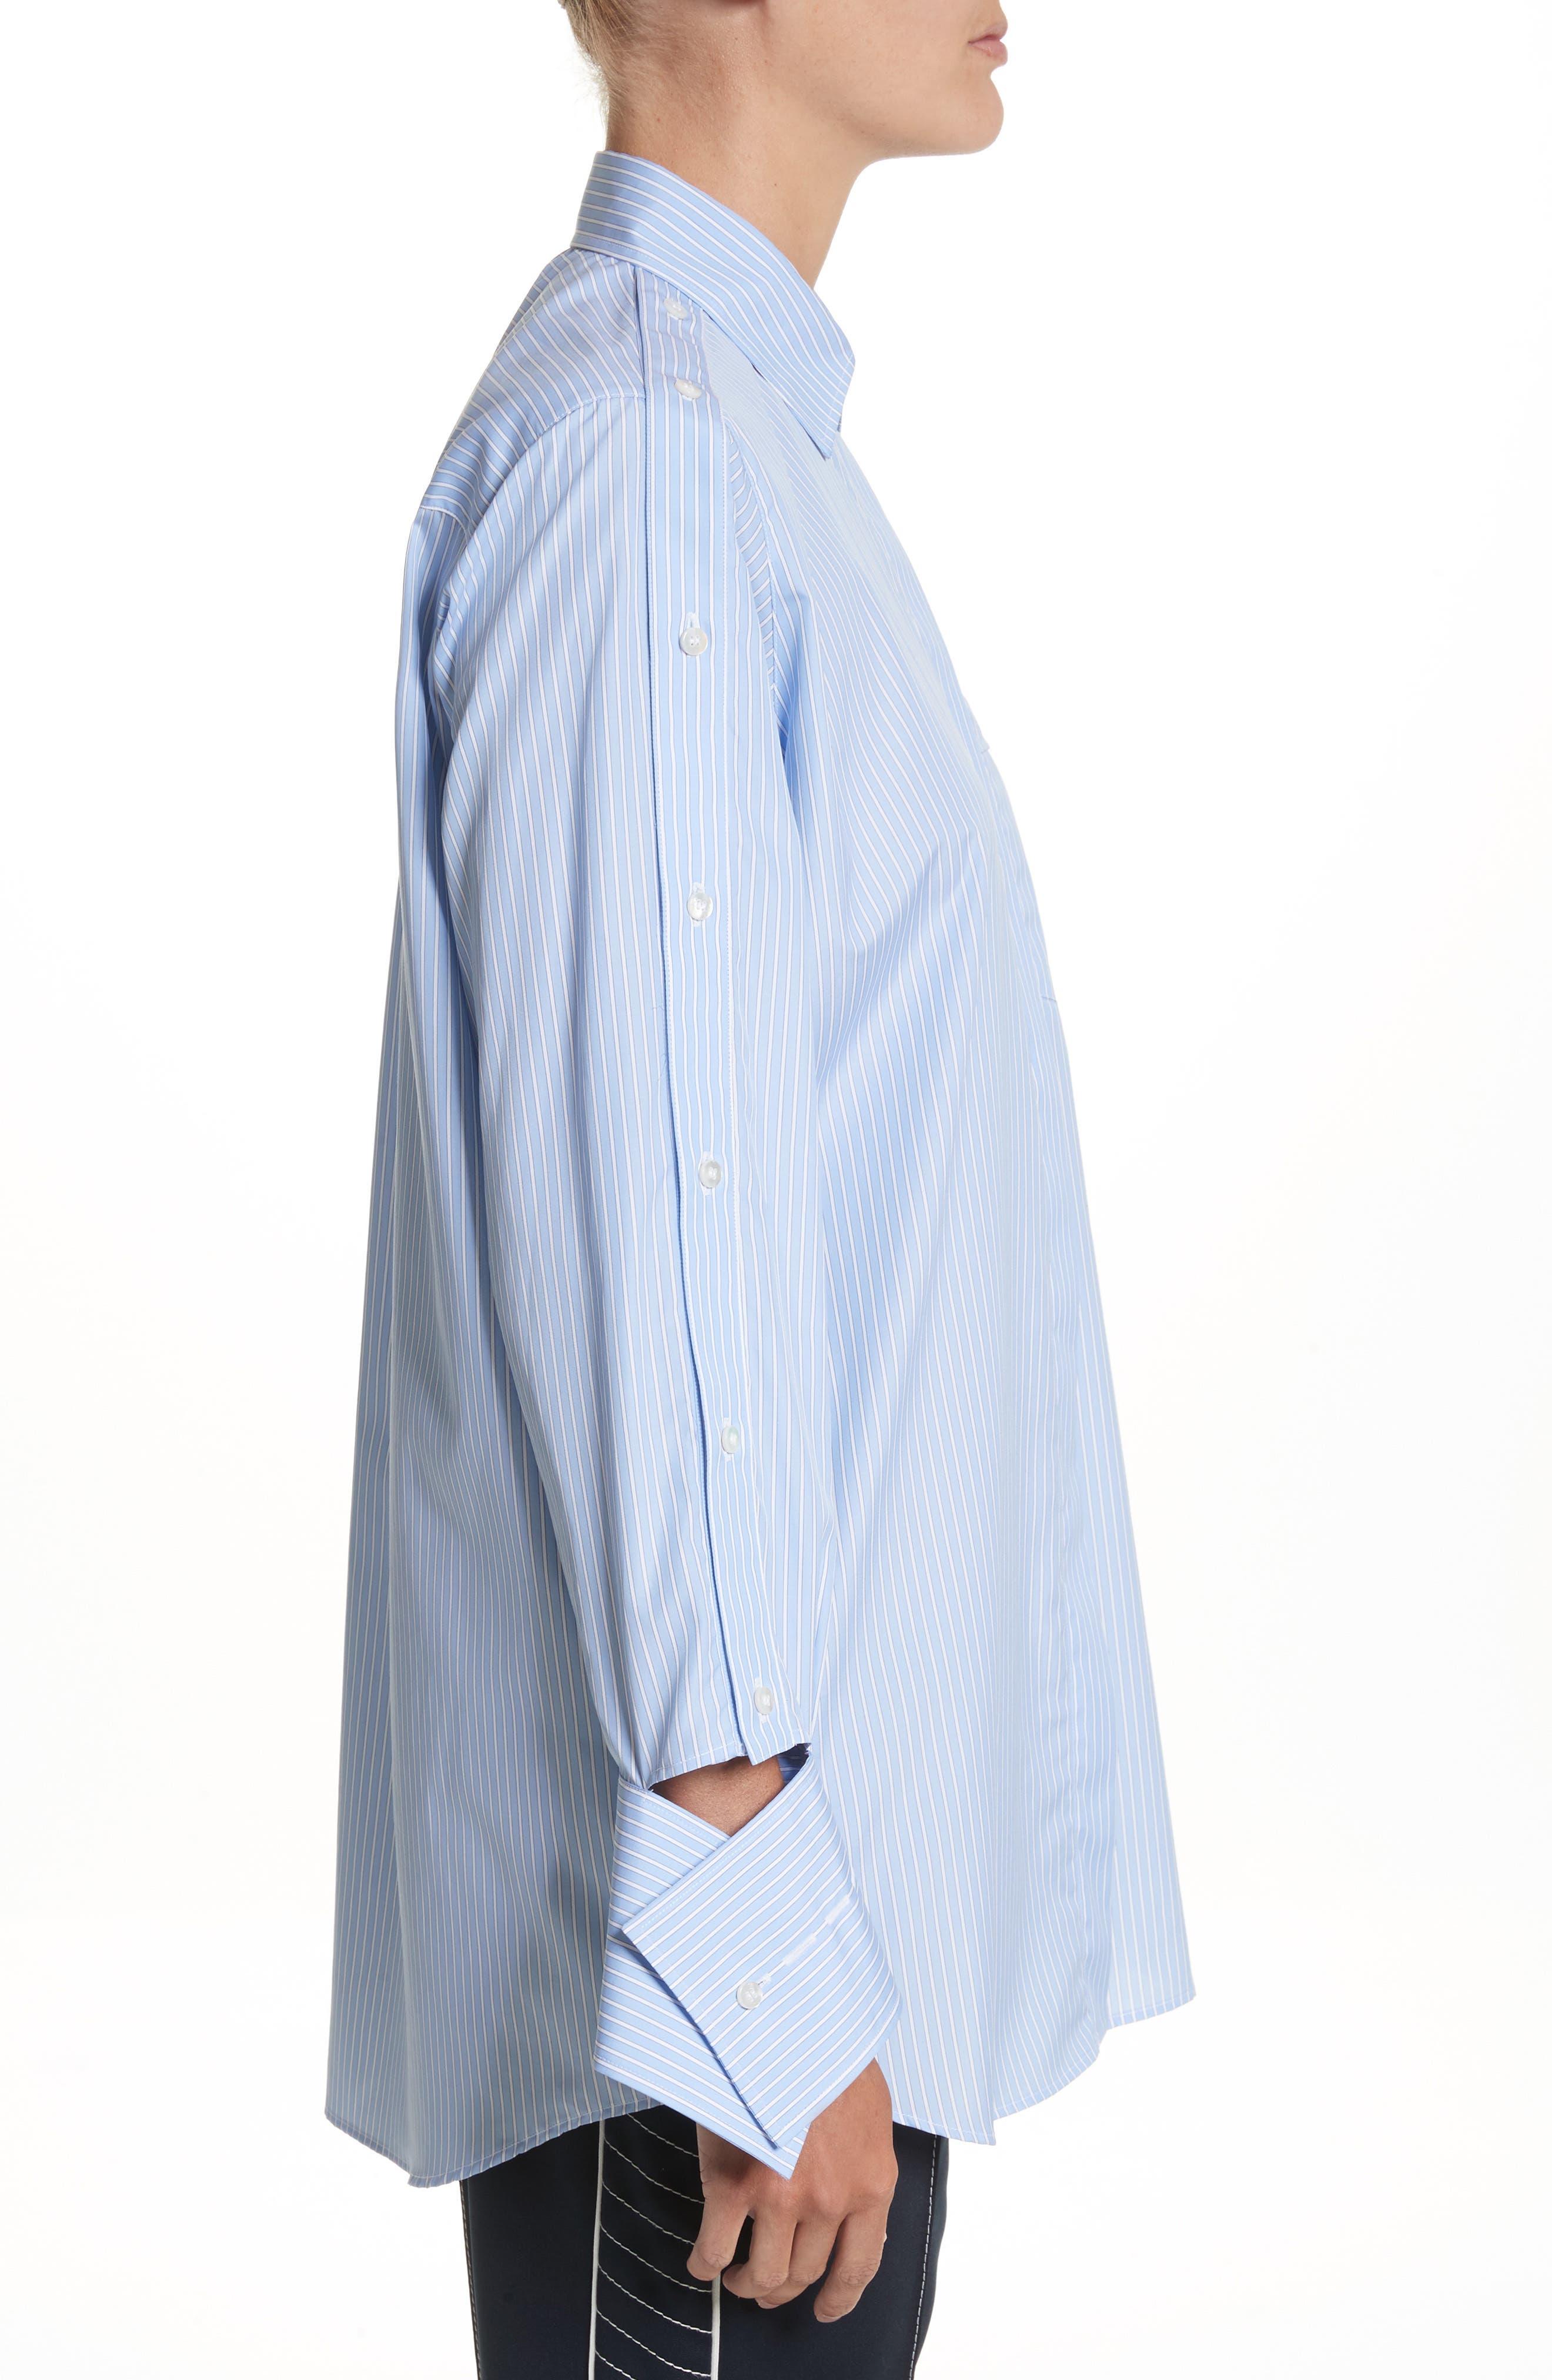 Cutaway Sleeve Cotton Poplin Shirt,                             Alternate thumbnail 3, color,                             Blue / White